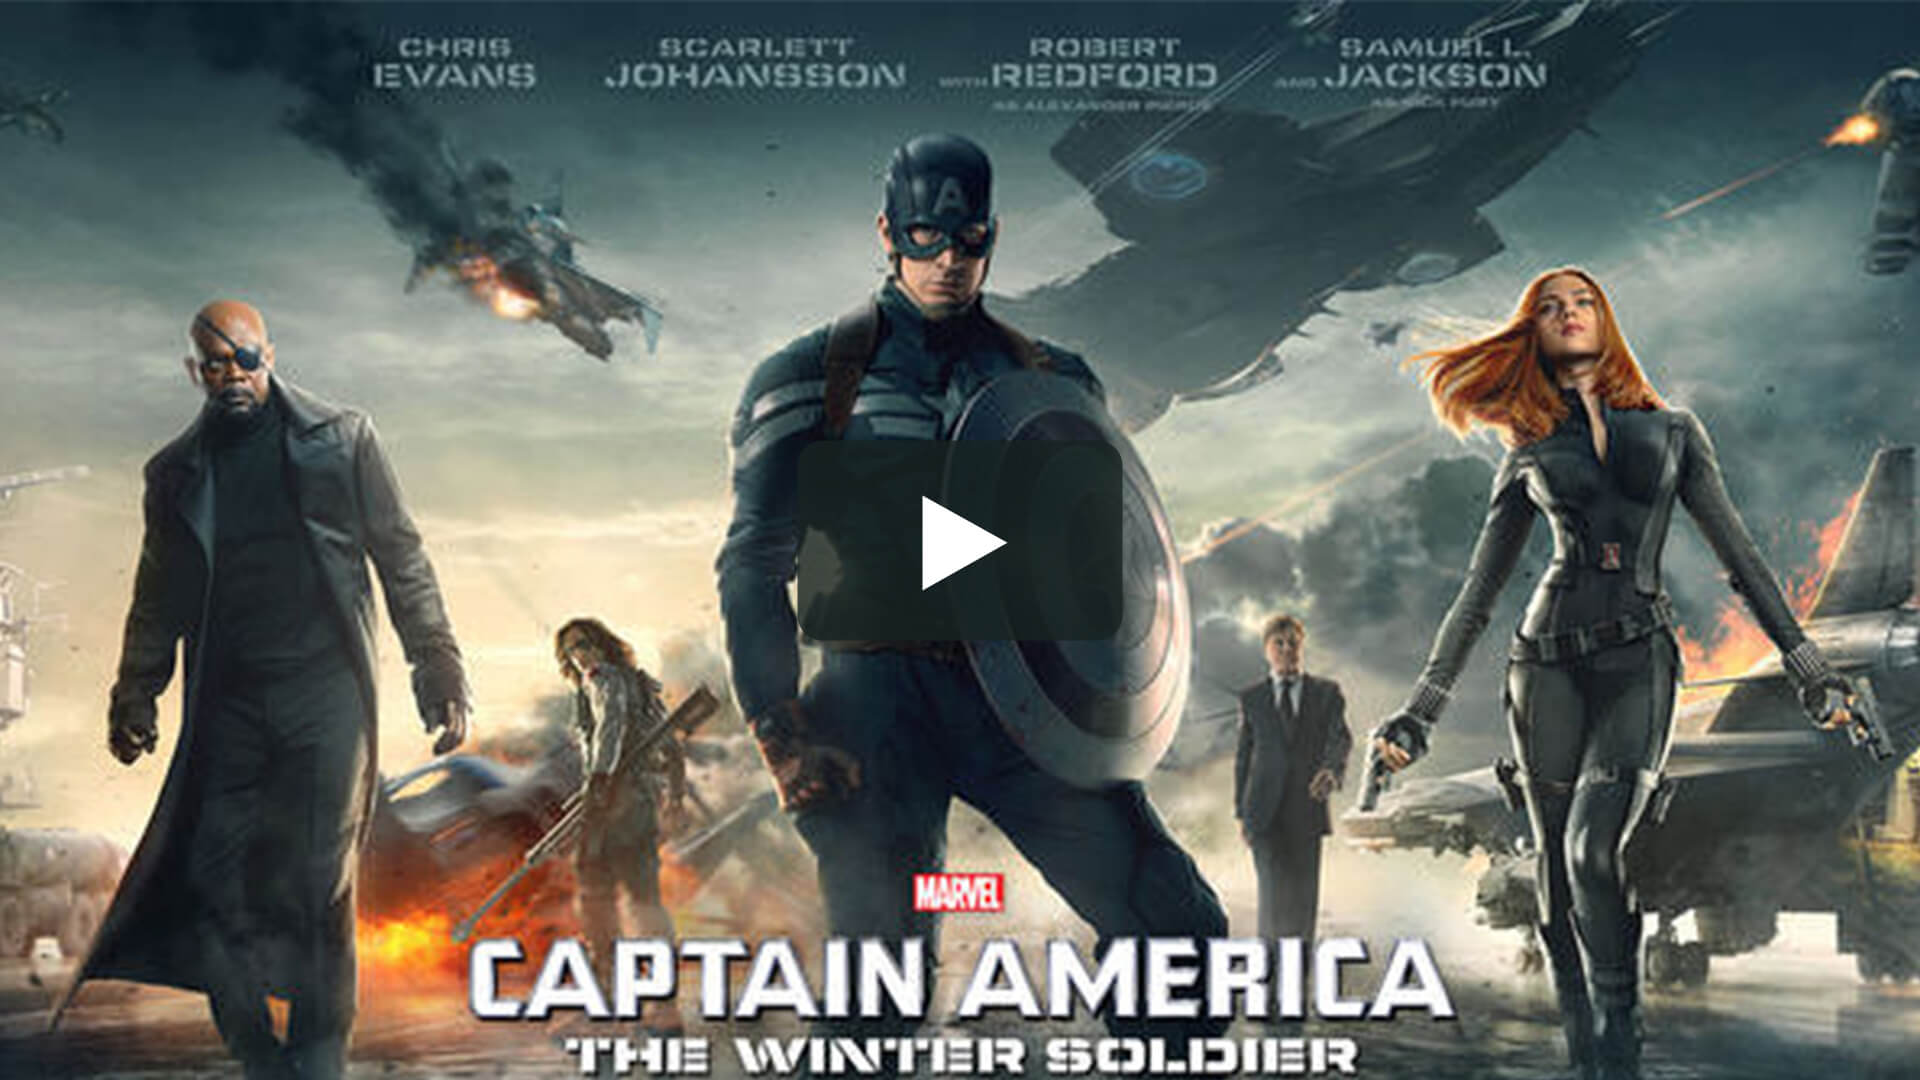 Captain America: The Winter Soldier - 美國隊長2